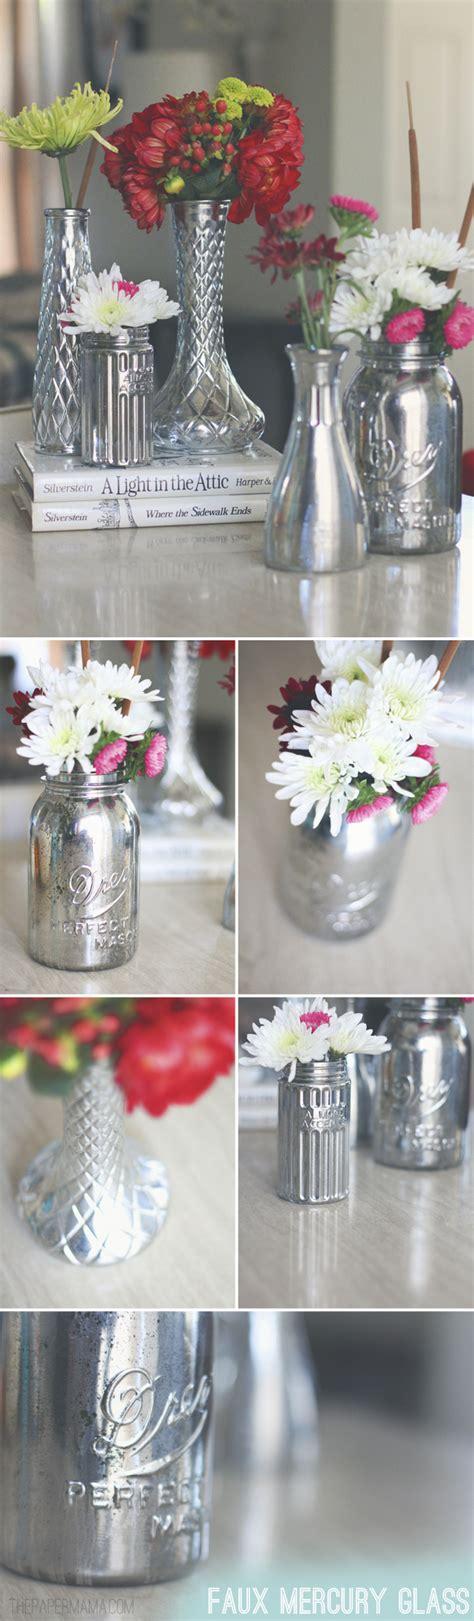 Diy Mercury Glass Vases - faux mercury glass vases diy